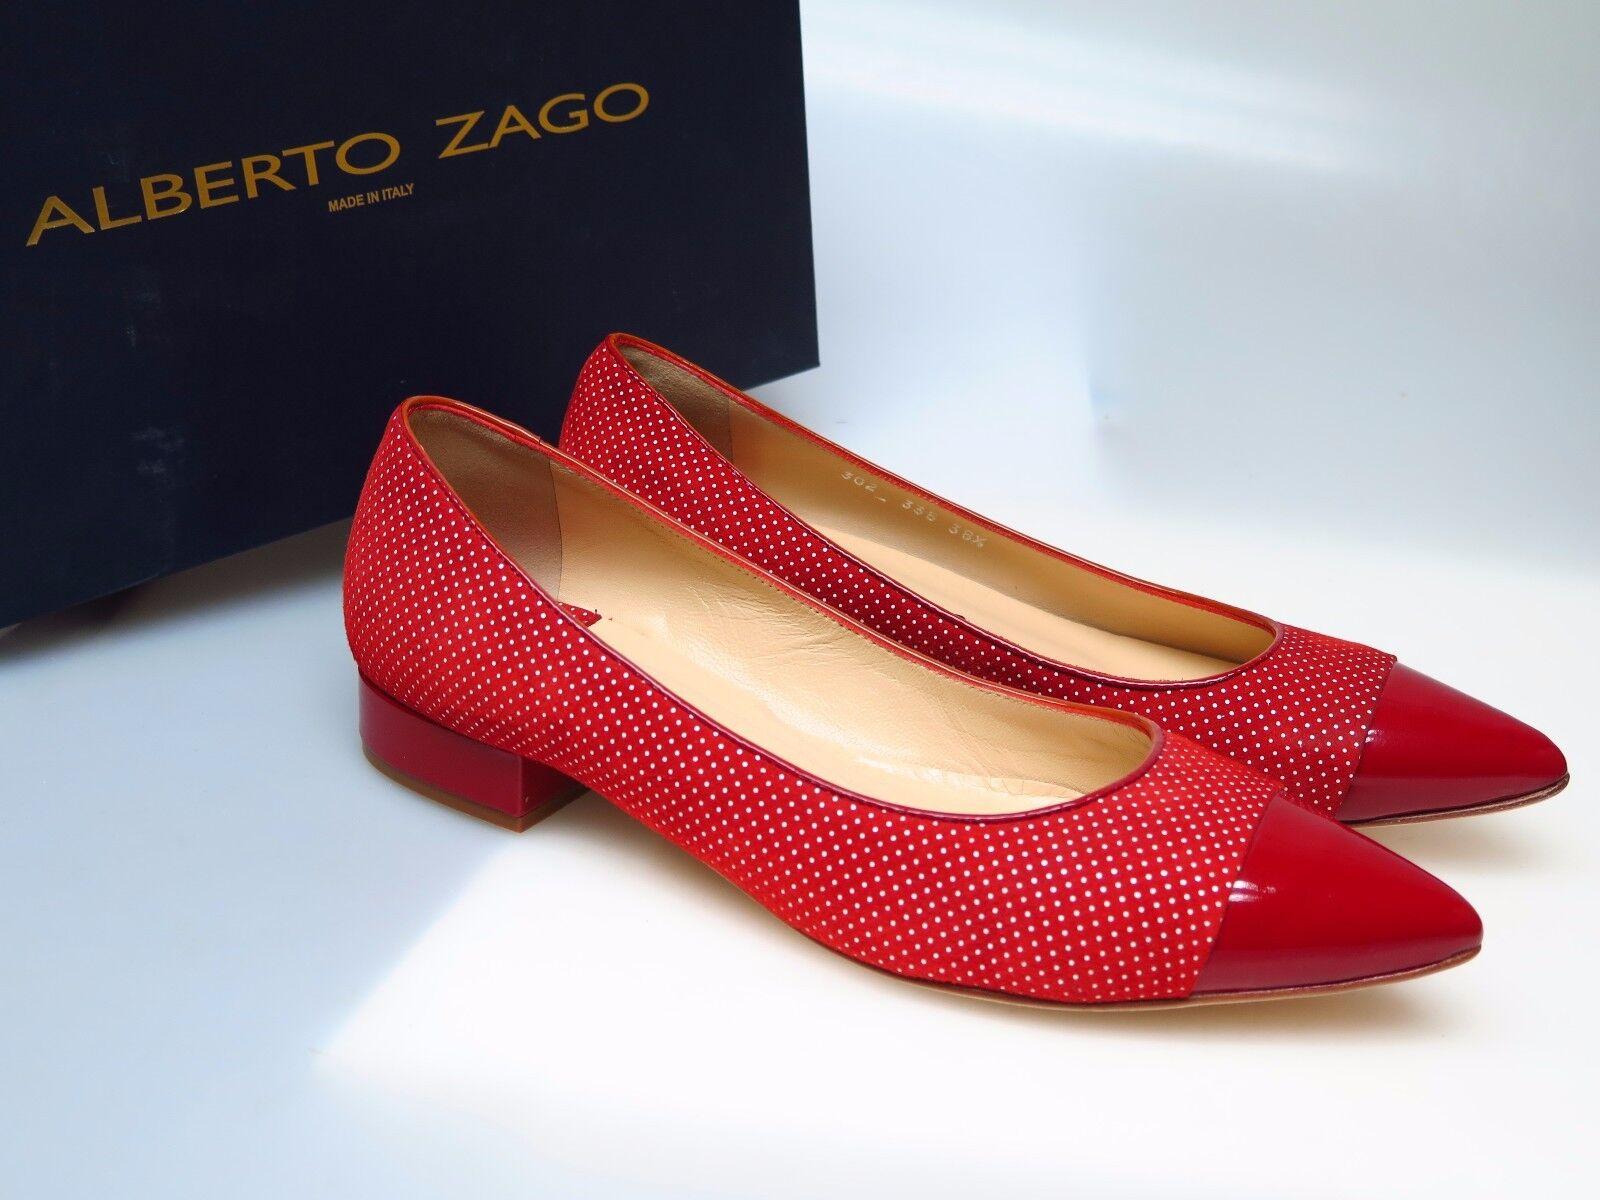 ALBERTO Risa ZAGO Damenschuhe Schuhe 302 Vernice Pois Piccolo Risa ALBERTO Gr. EU 38,5 NEU 3e68f5